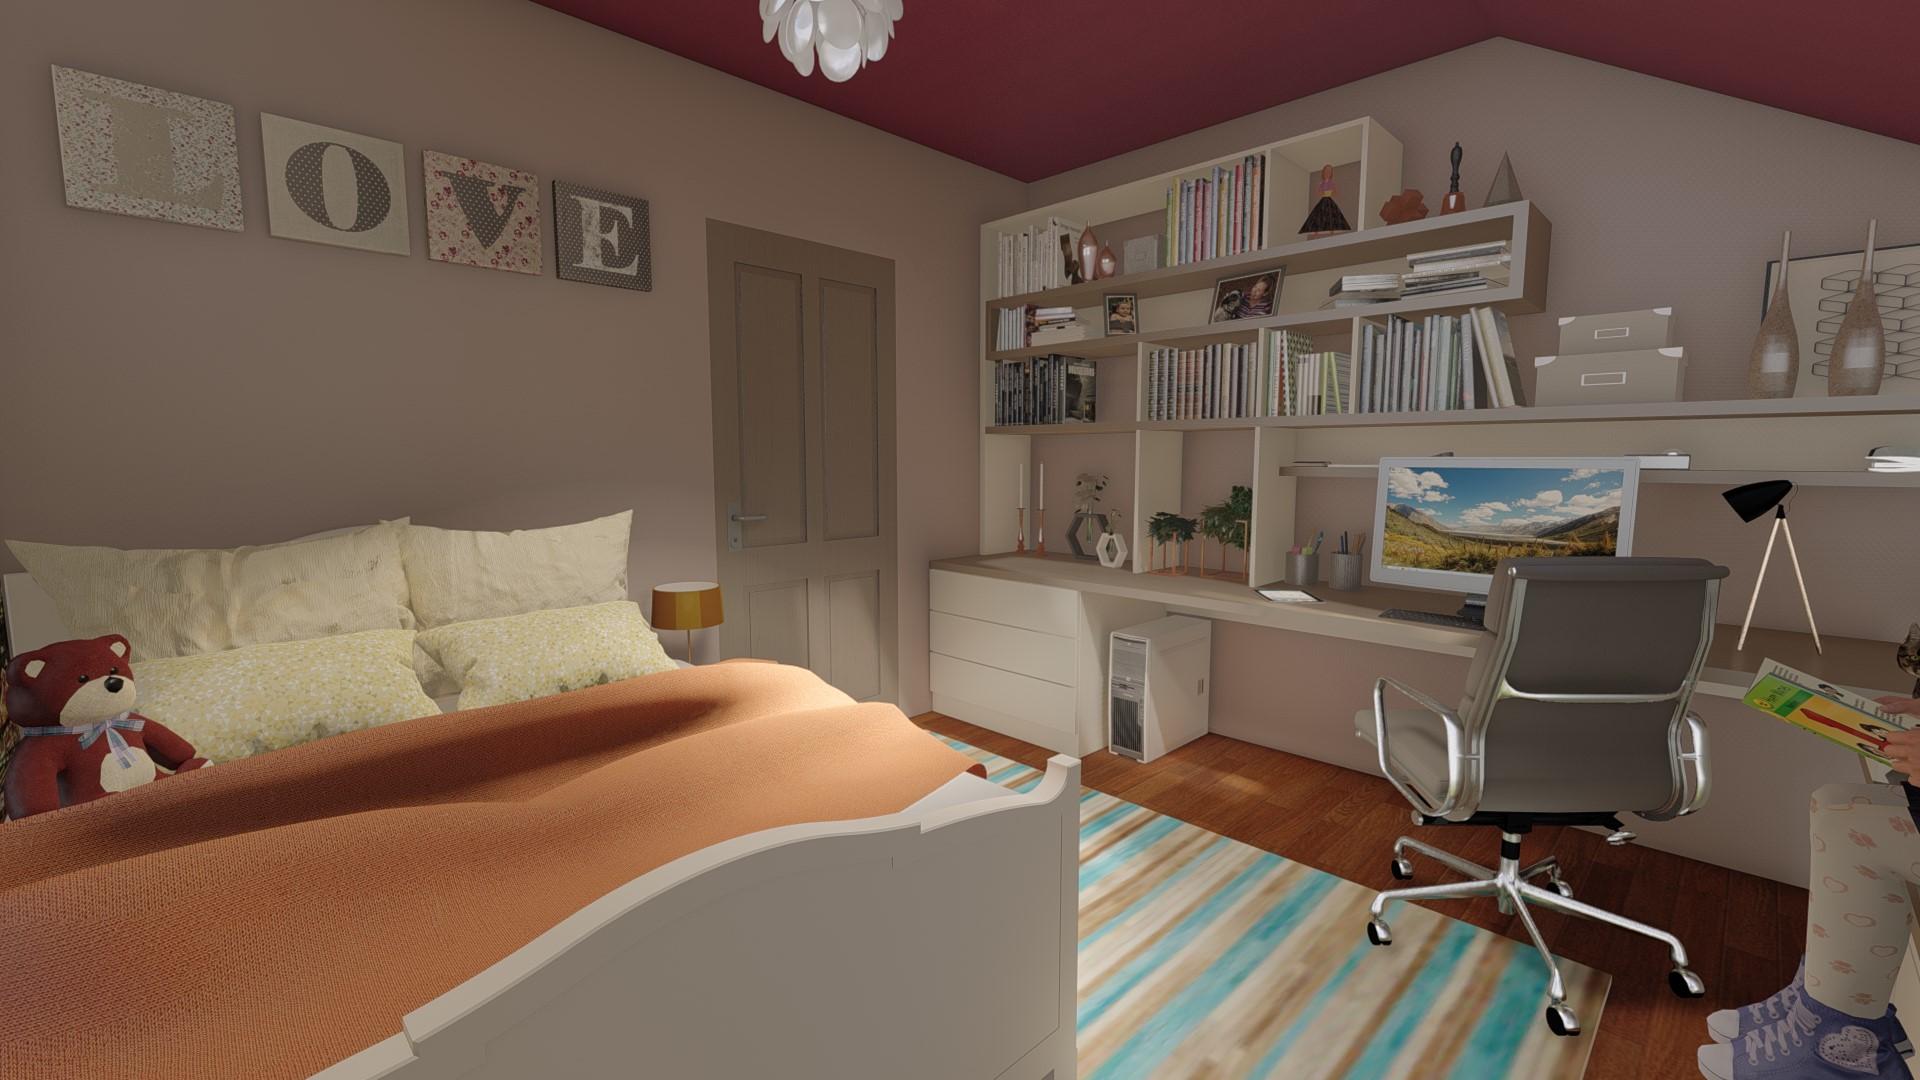 chidrens room